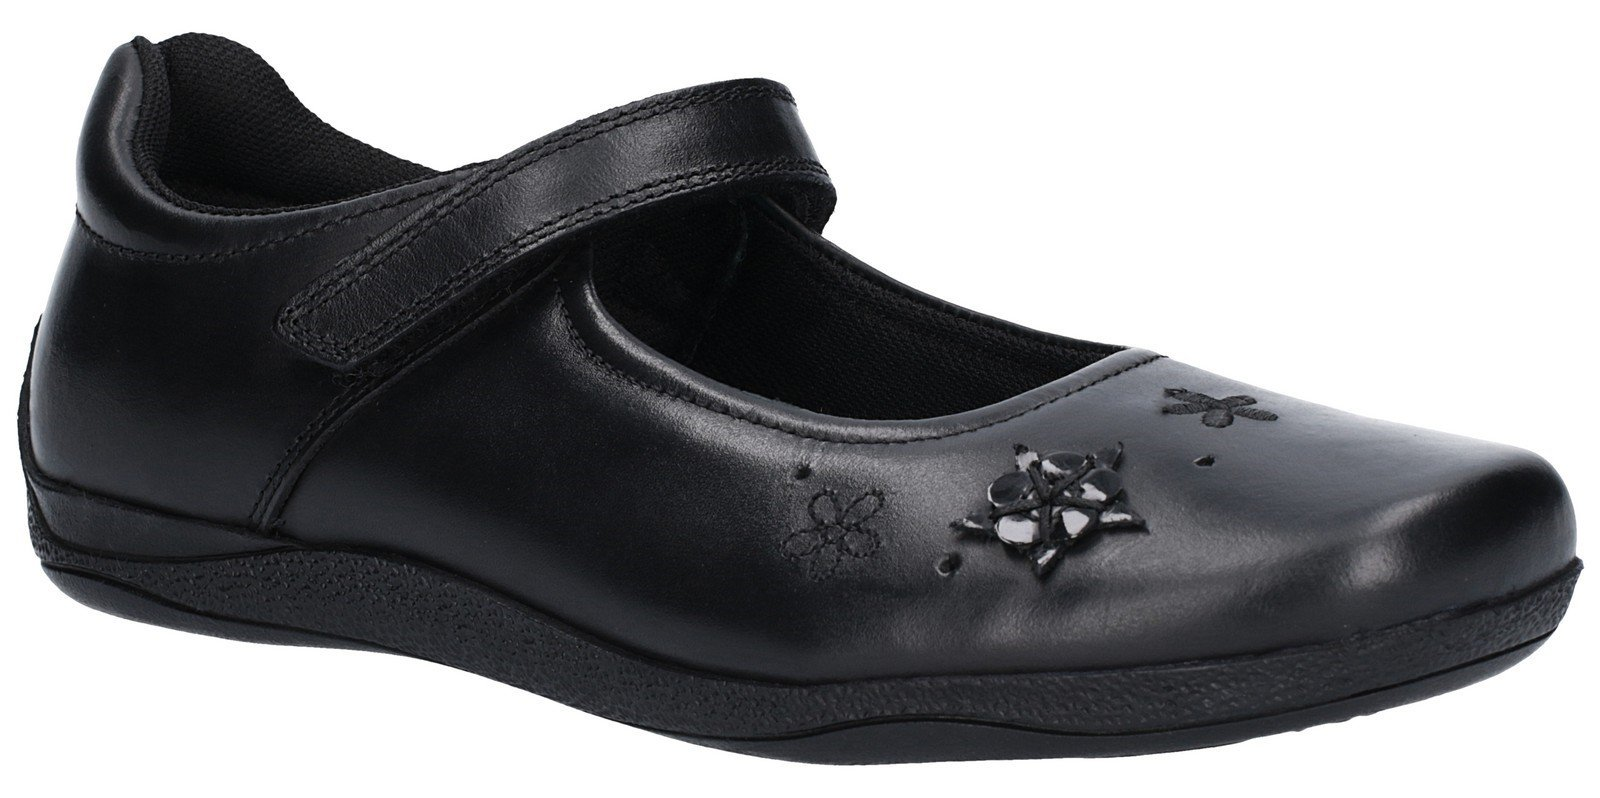 Hush Puppies Kid's Candy Senior Touch Fastening Shoe Black 27455 - Black 3 UK